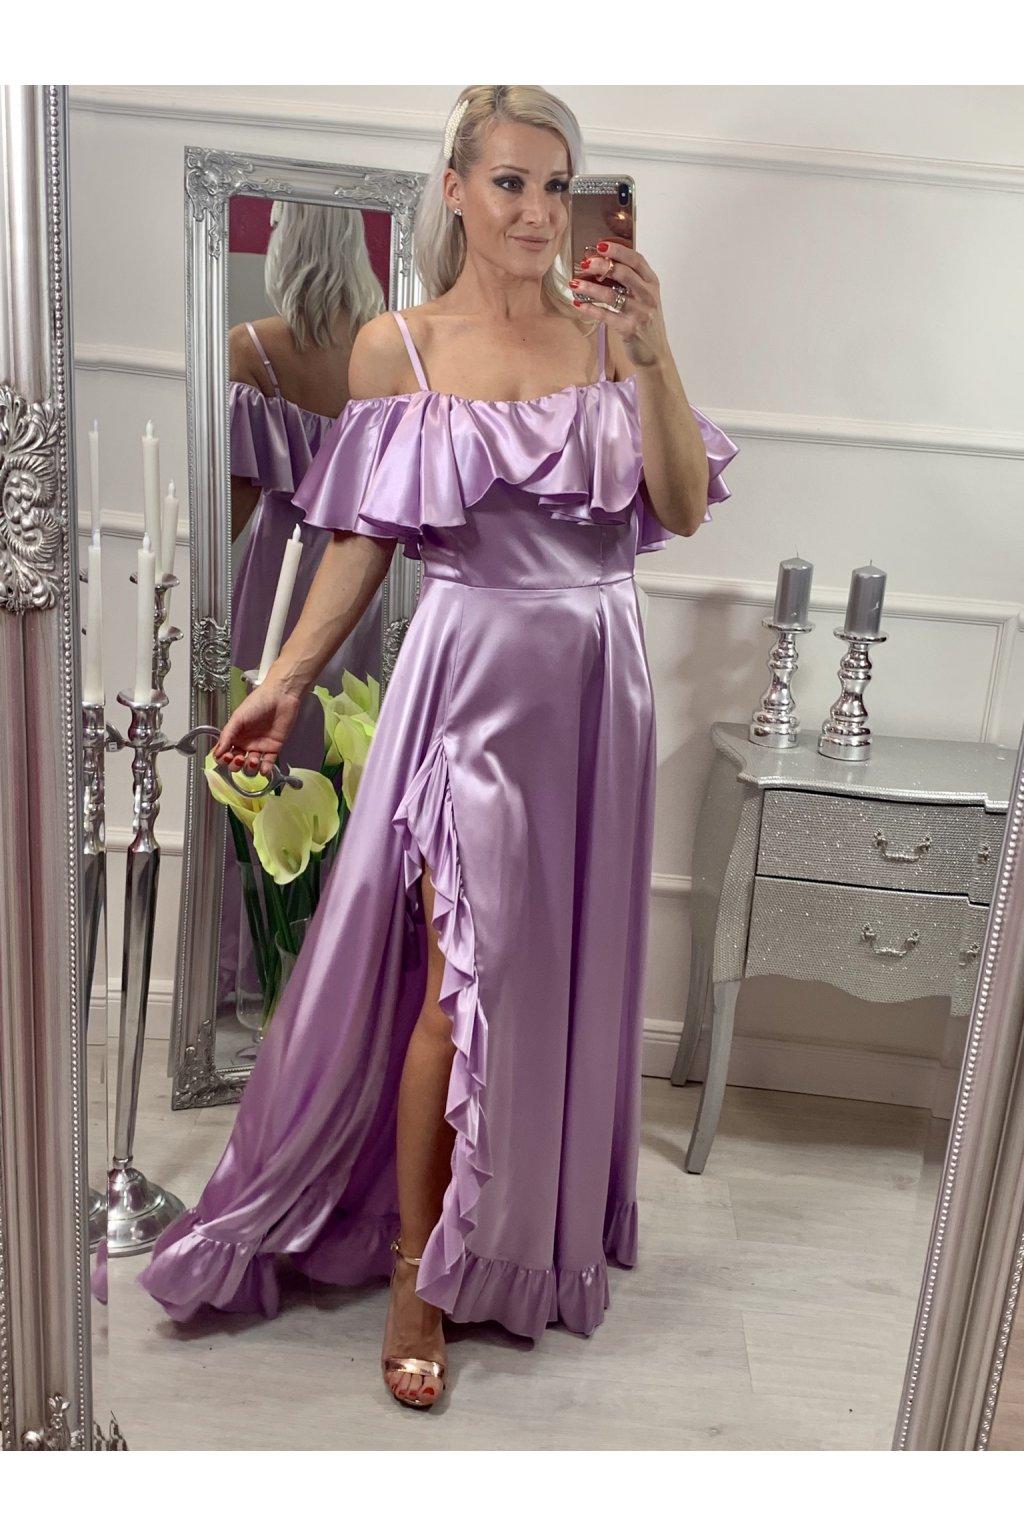 Scarlet - dámske dlhé spoločenské šaty s volánikmi - fialová